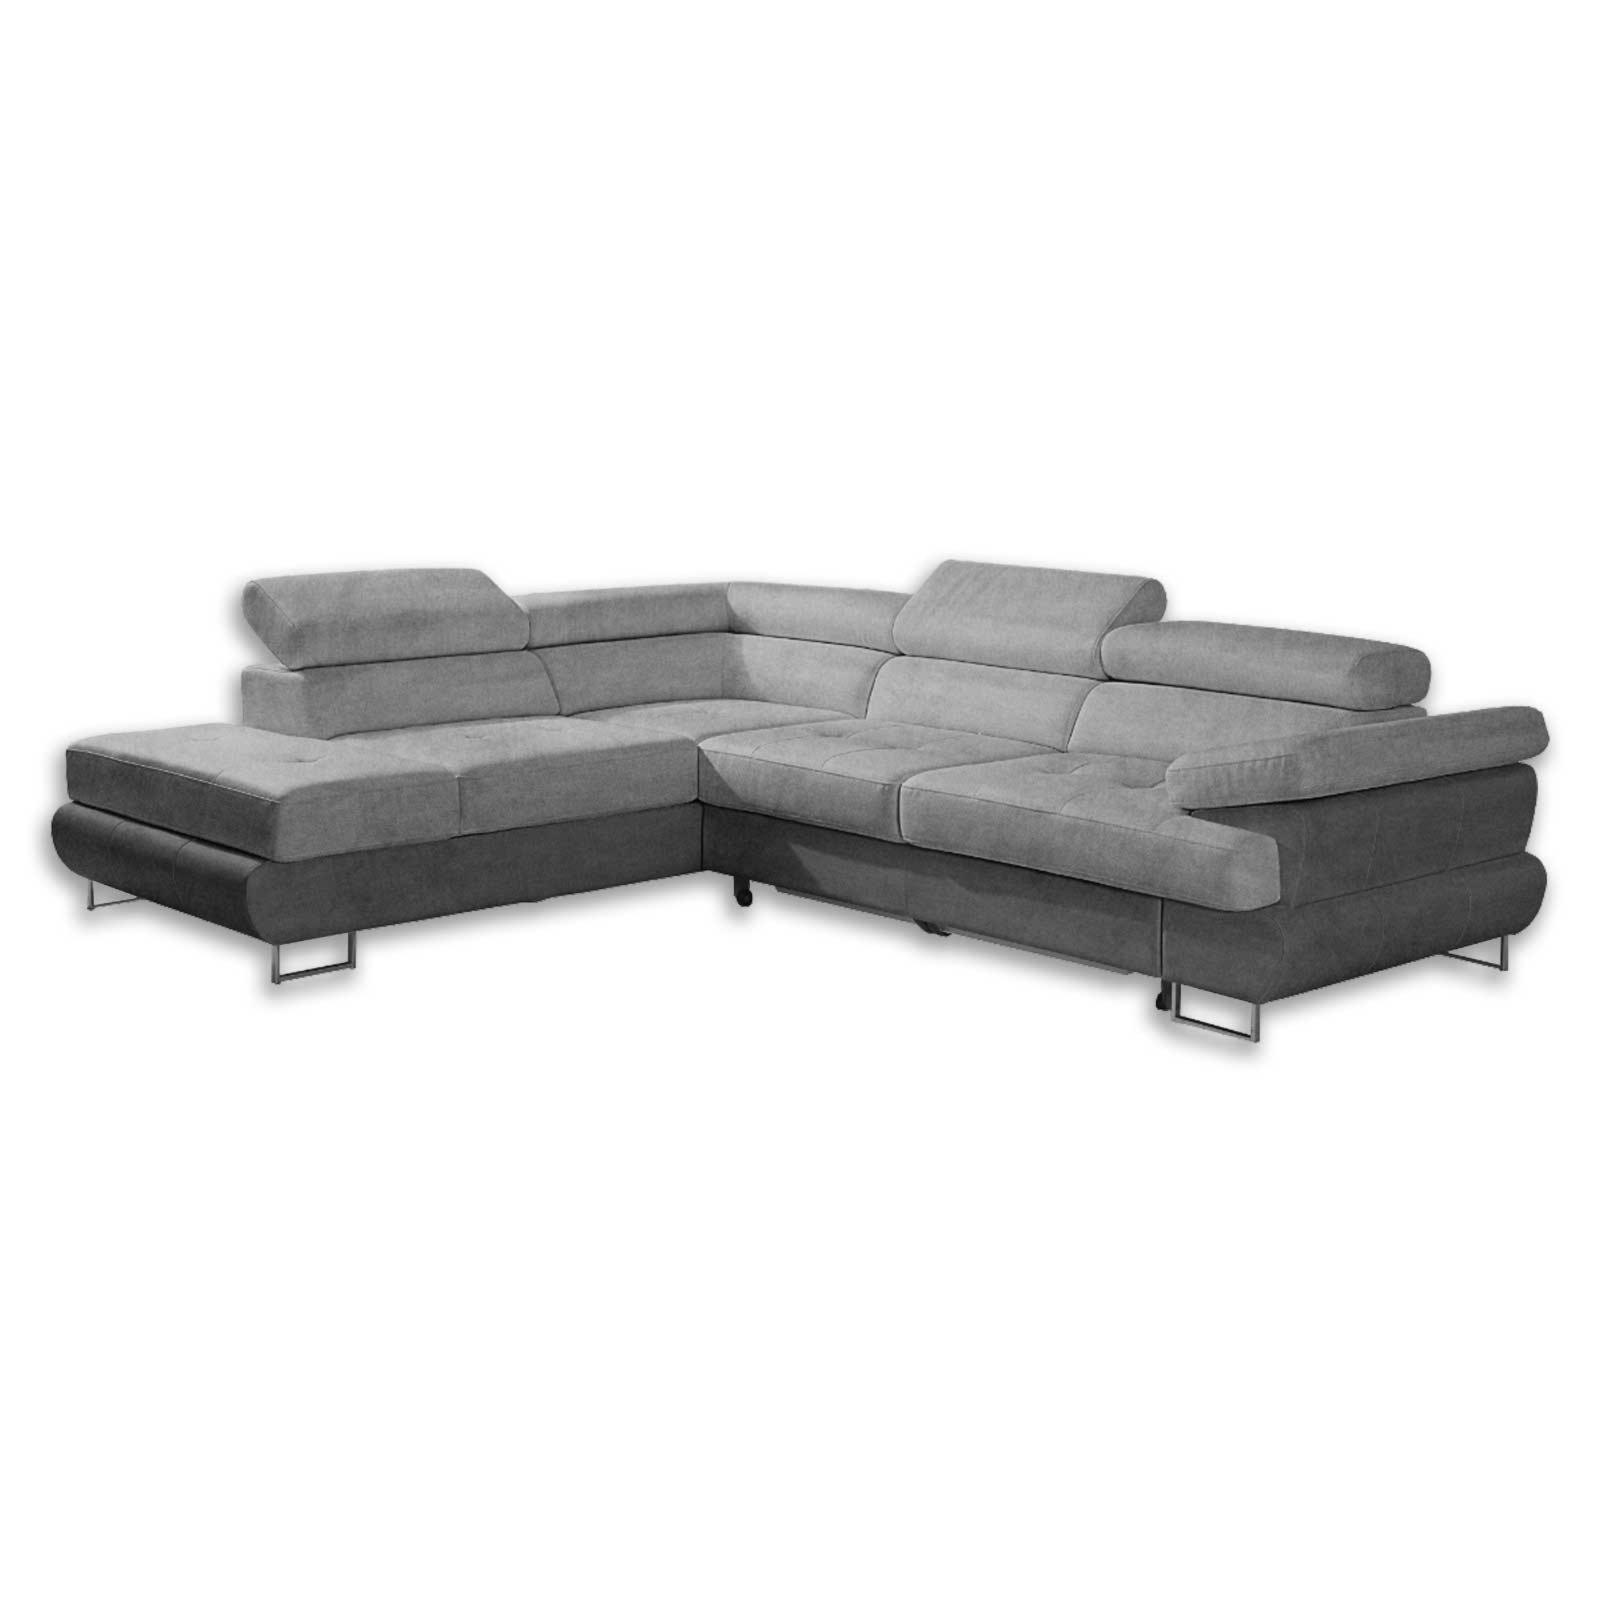 ecksofa hellgrau mit funktion ottomane links ecksofas l form sofas couches m bel. Black Bedroom Furniture Sets. Home Design Ideas